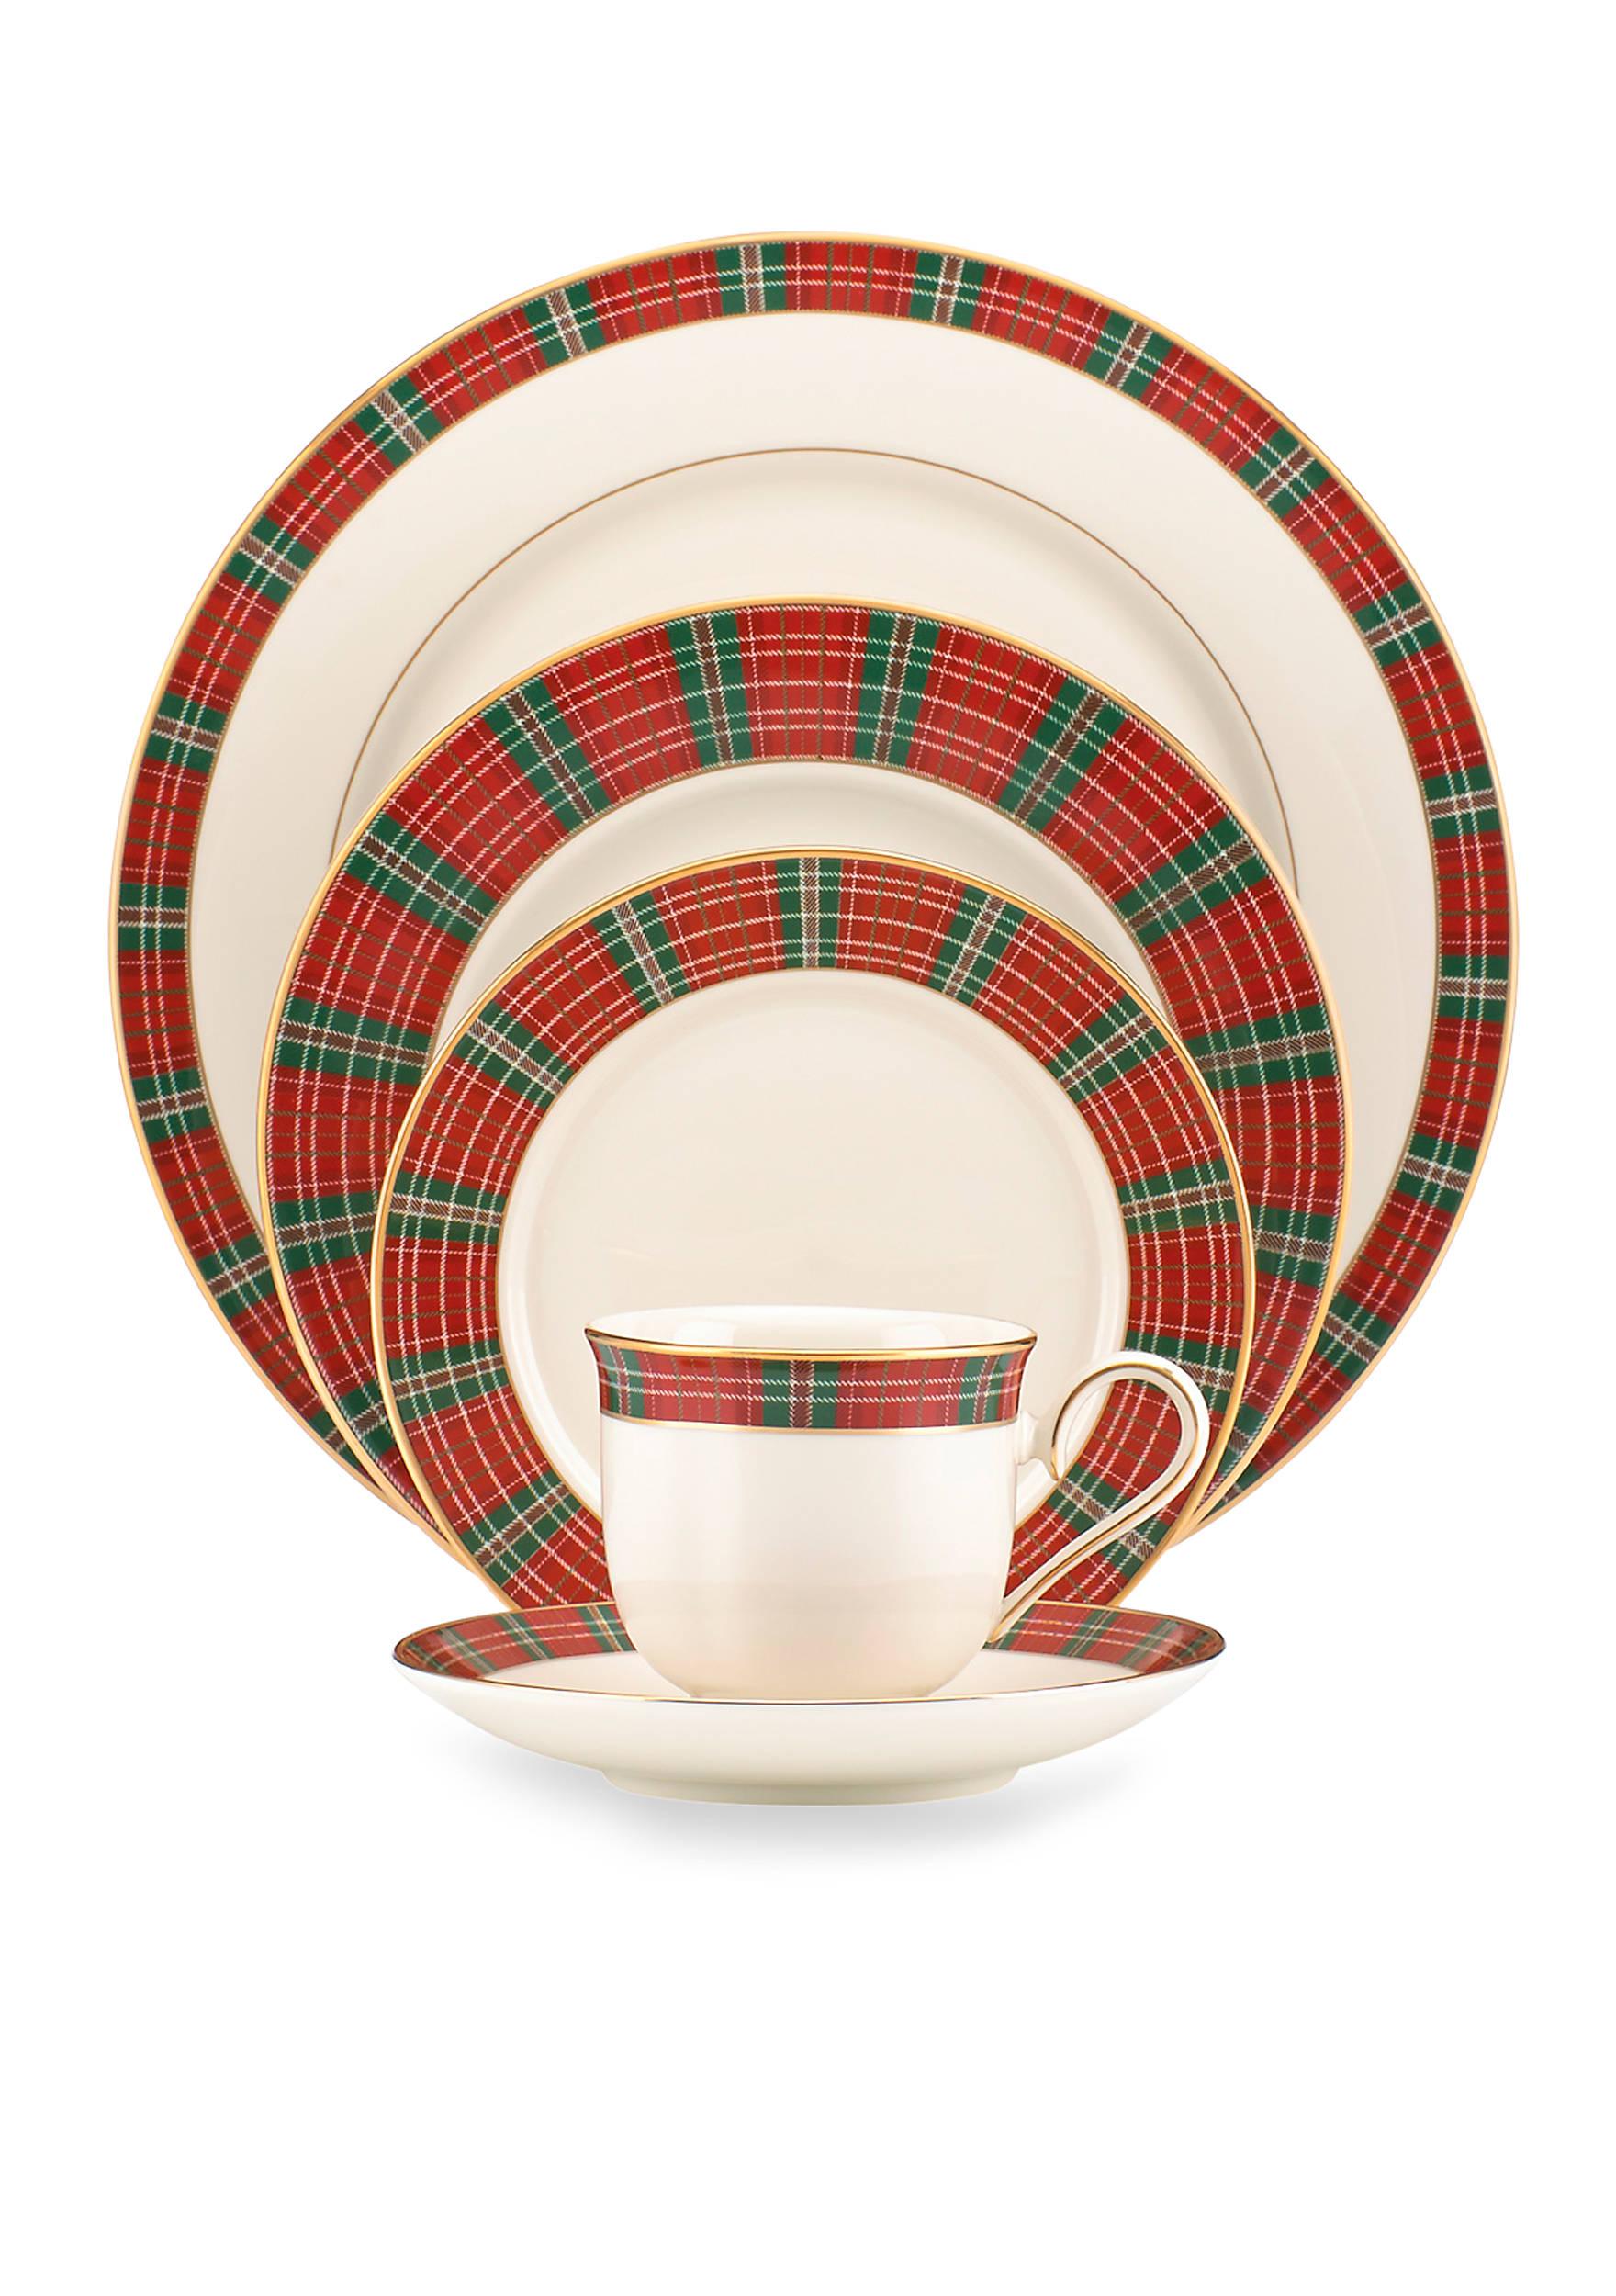 Lenox winter greetings plaid dinnerware belk winter greetings plaid dinnerware collection kristyandbryce Choice Image